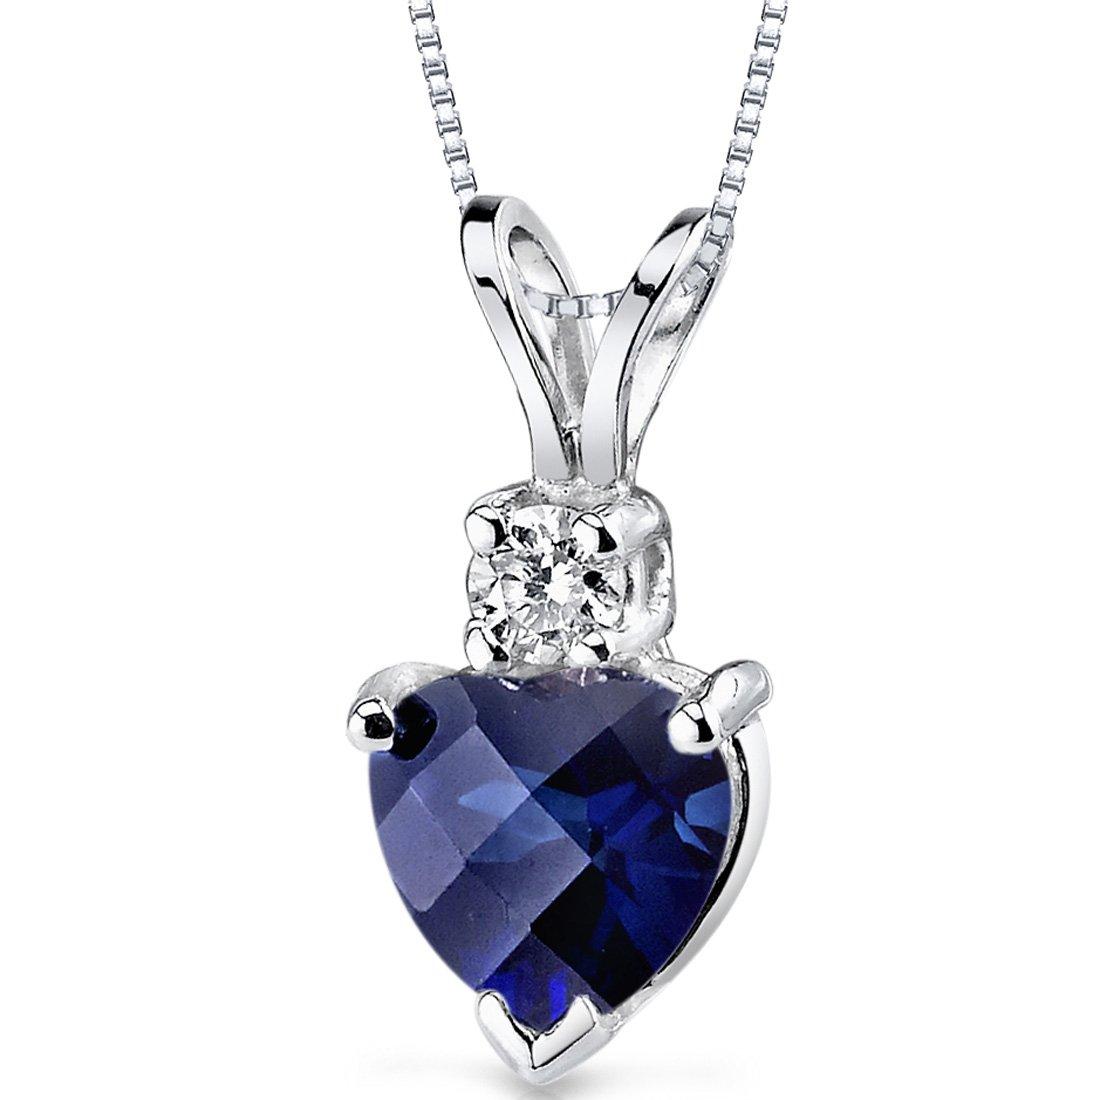 14 Karat White Gold Heart Shape 1.00 Carats Created Blue Sapphire Diamond Pendant by Peora